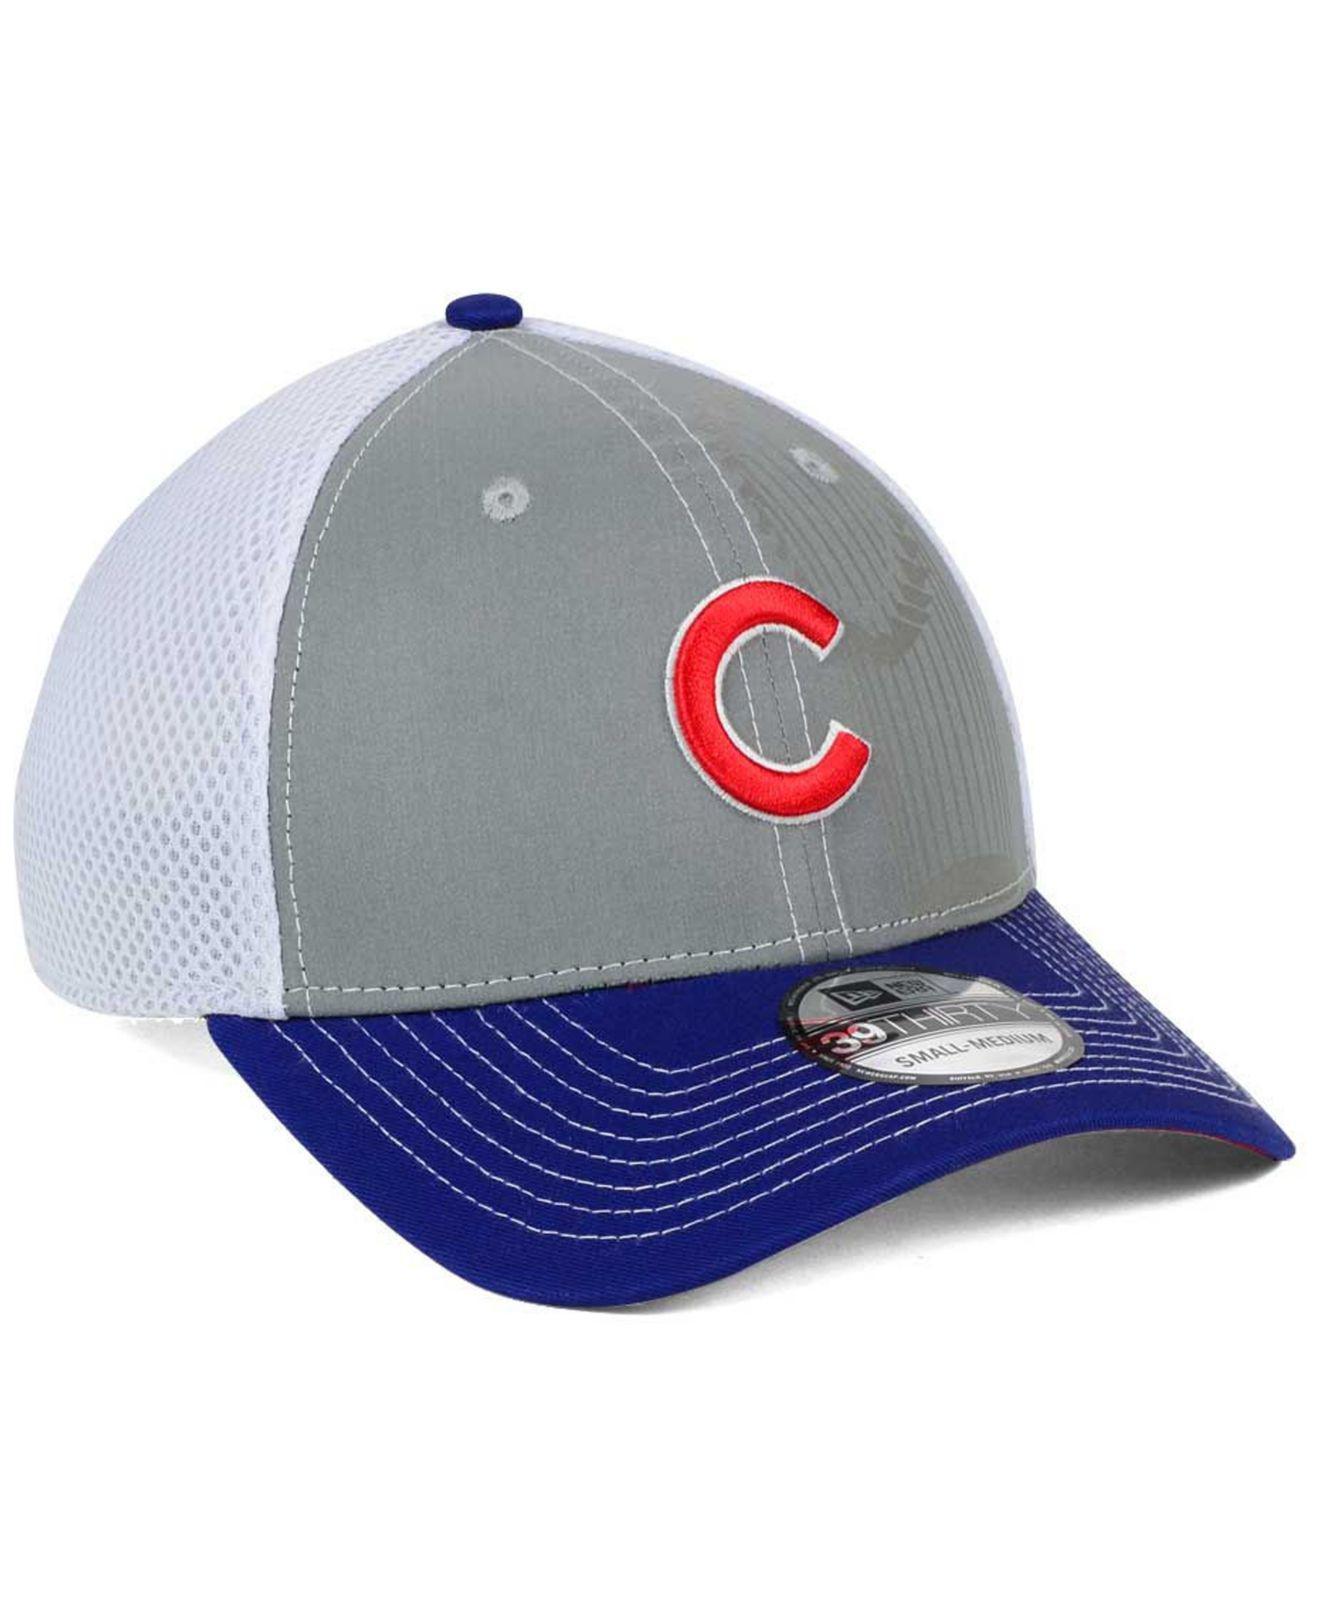 c68dd446ab2 ... wholesale lyst ktz reflective world series trophy 39thirty cap for men  48c69 ba103